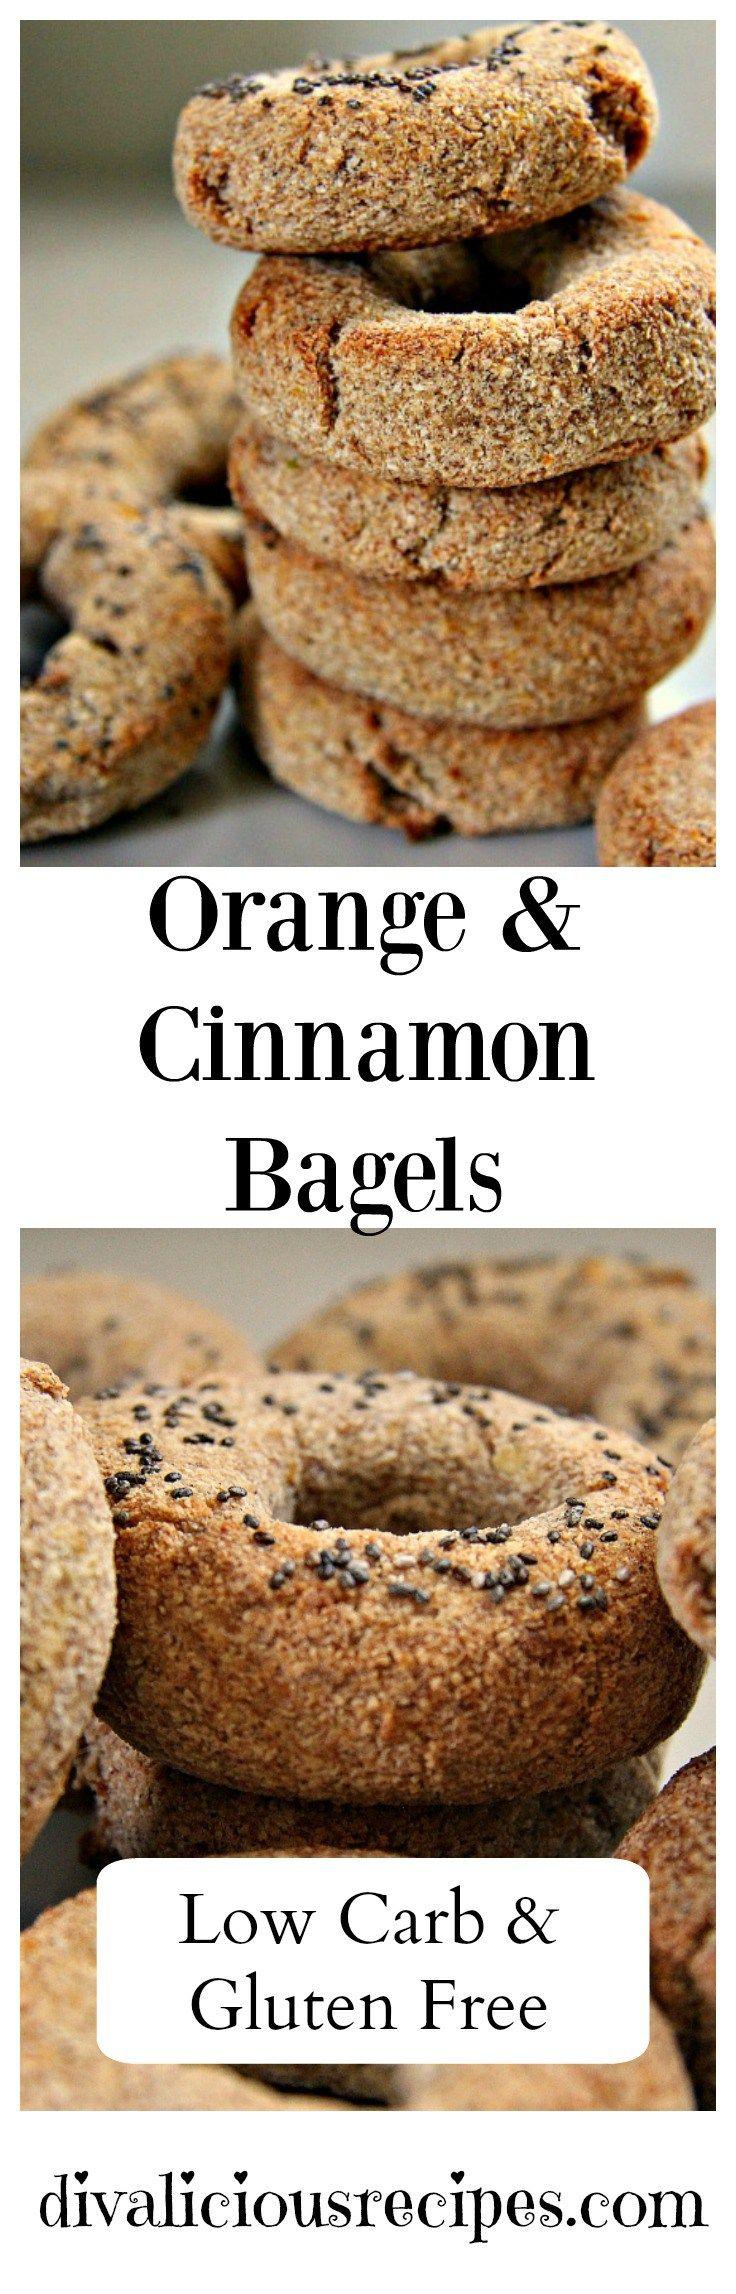 Low carb & gluten free orange & cinnamon bagels. Recipe: http://divaliciousrecipes.com/2016/12/01/orange-cinnamon-mini-bagels/